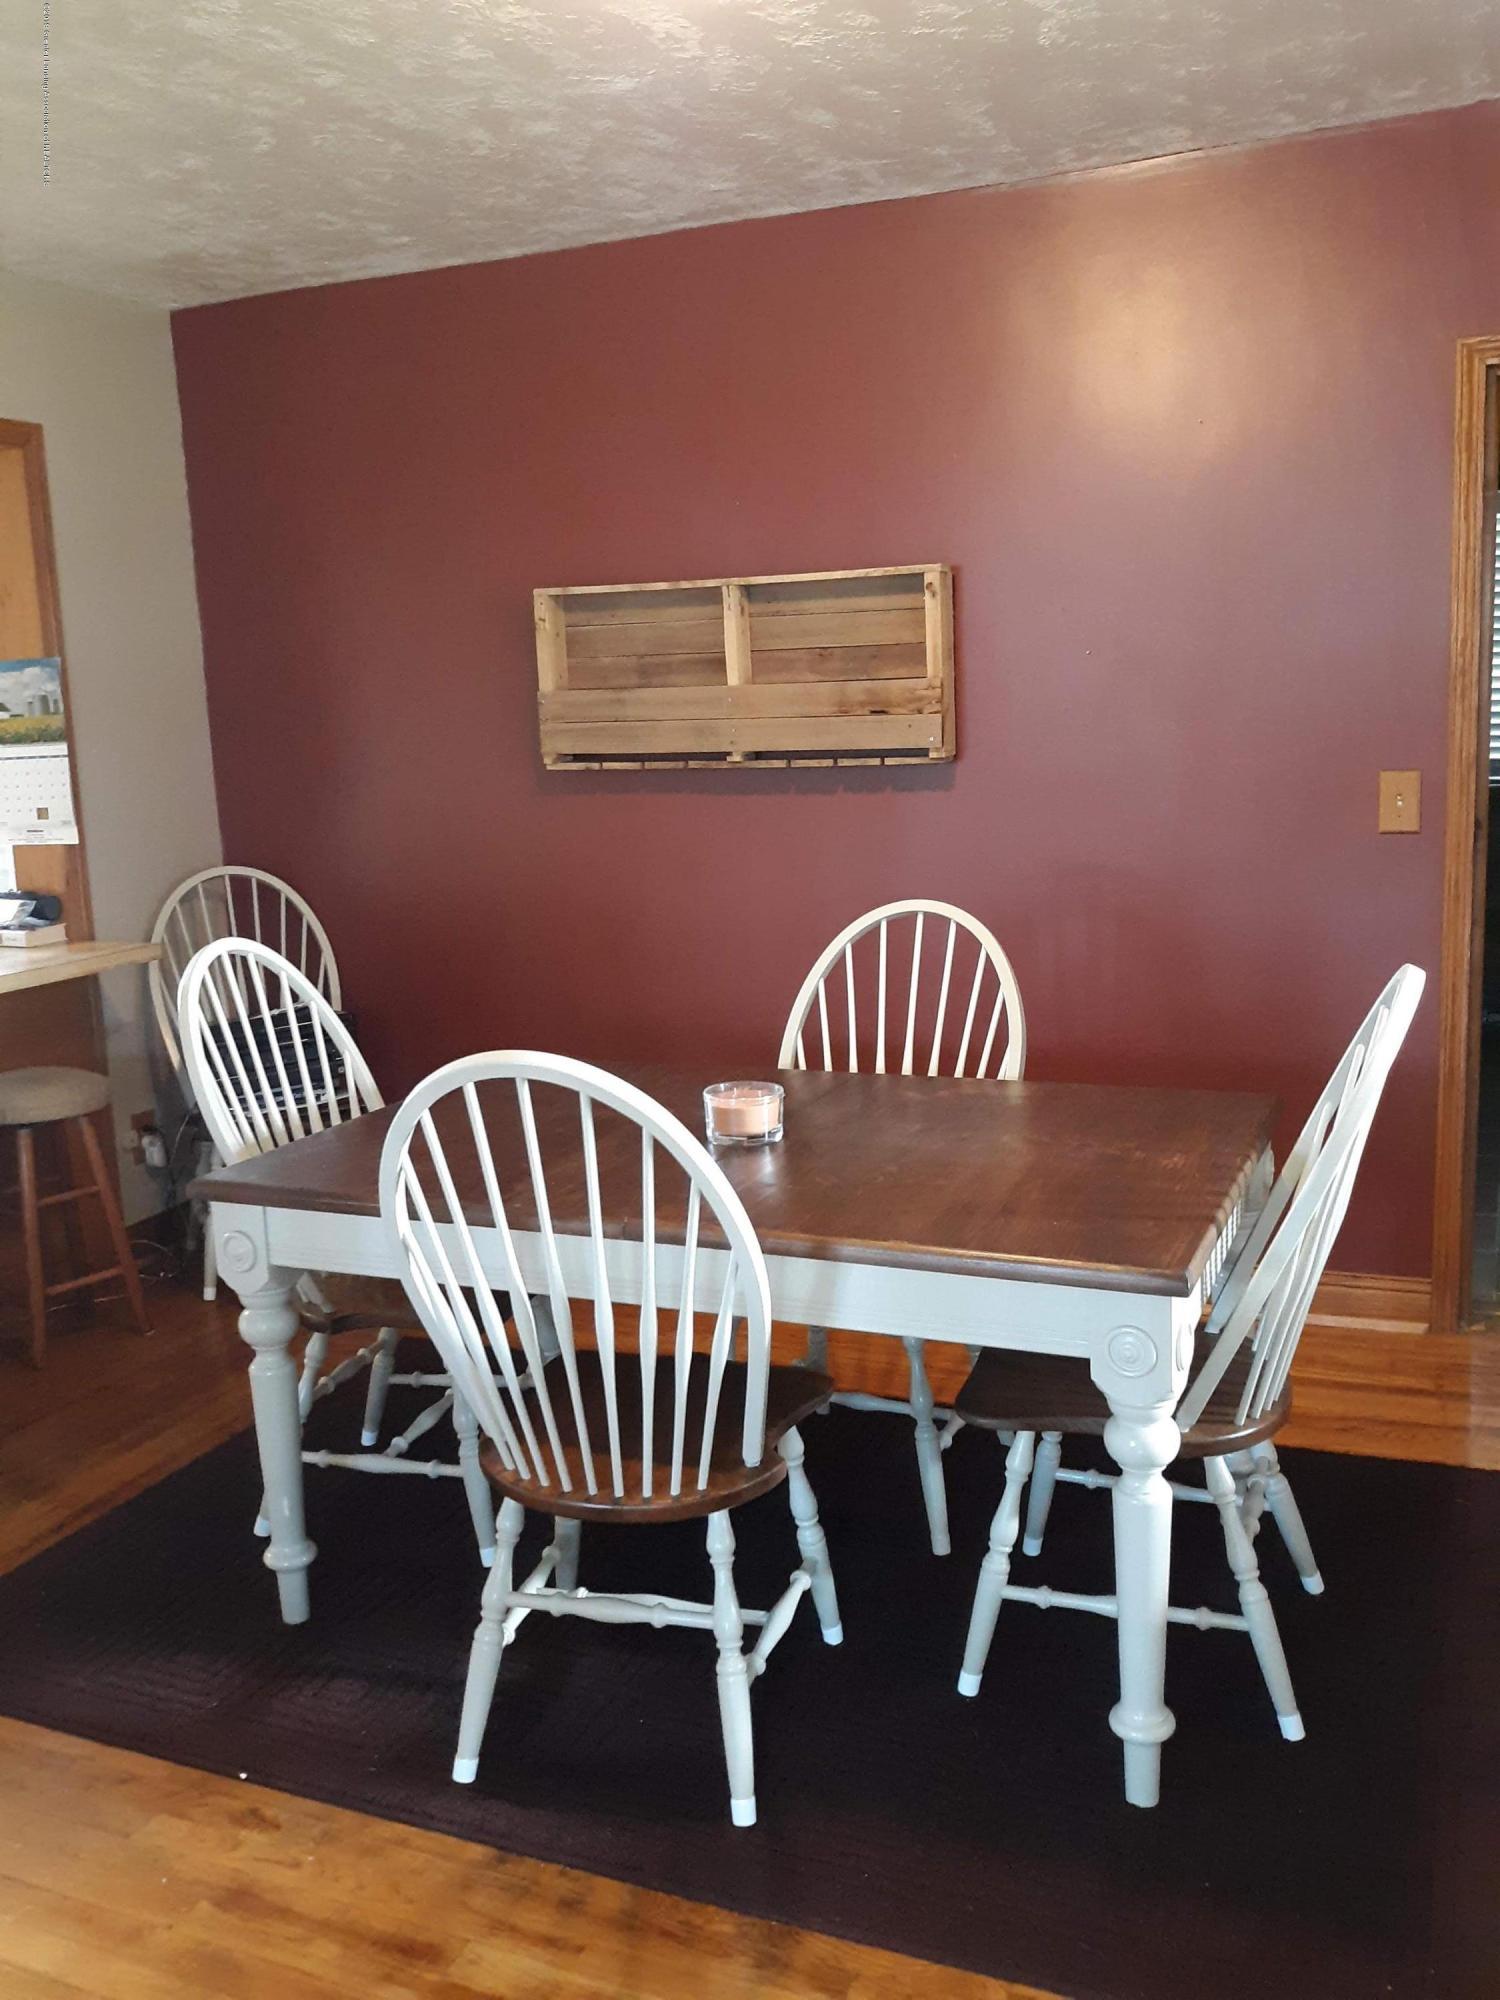 1592 N Chandler Rd - Dining Room - 7